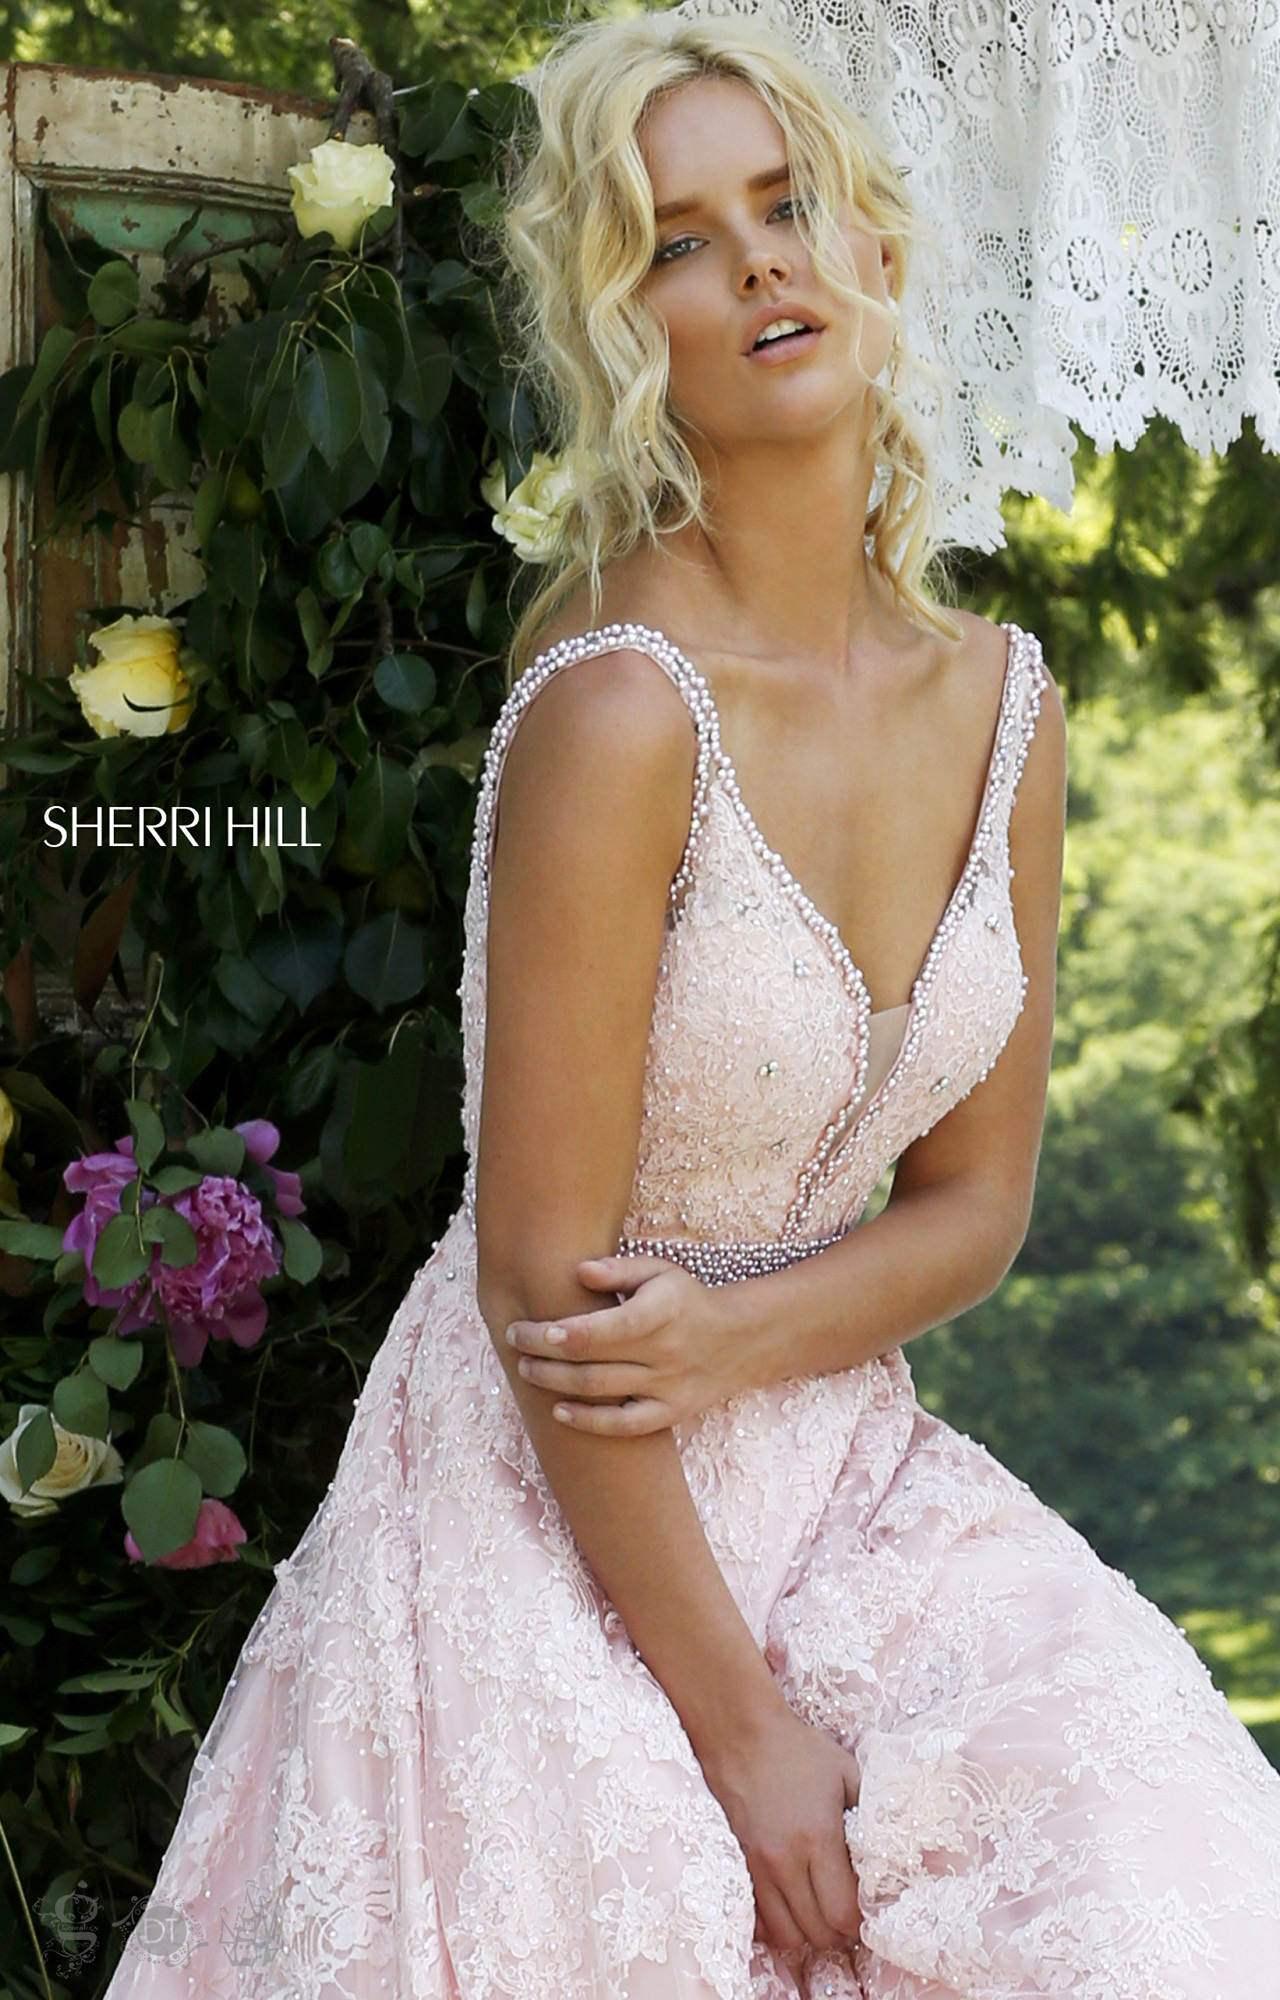 e95d8c077603 Sherri Hill 11314 - Luscious in Lace Ball Gown